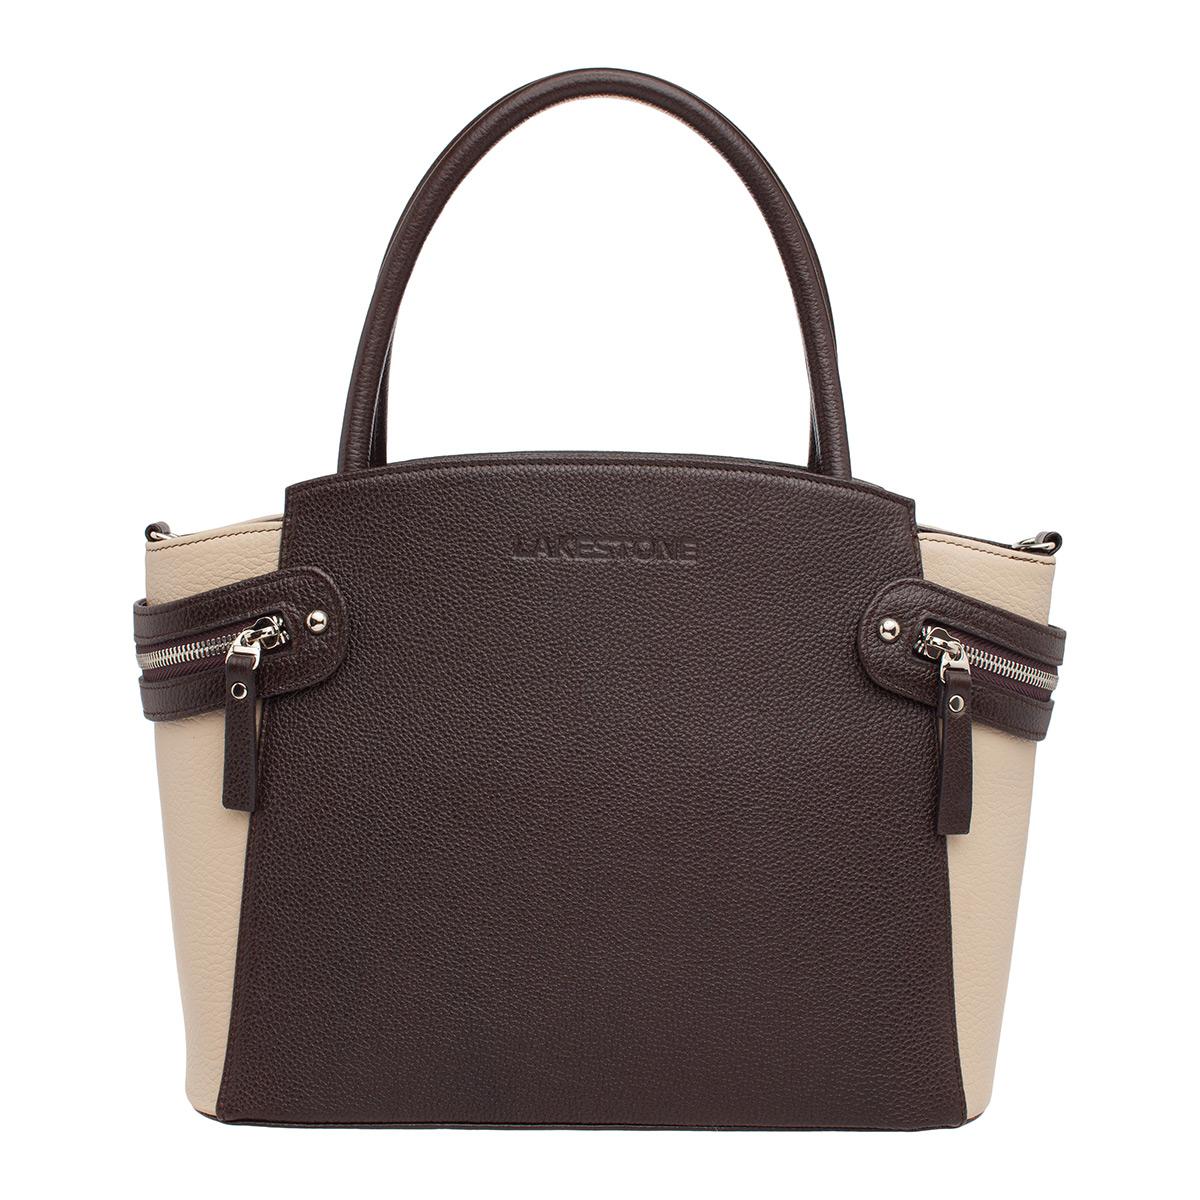 Купить Кожаная женская сумка Hacket Brown/Beige